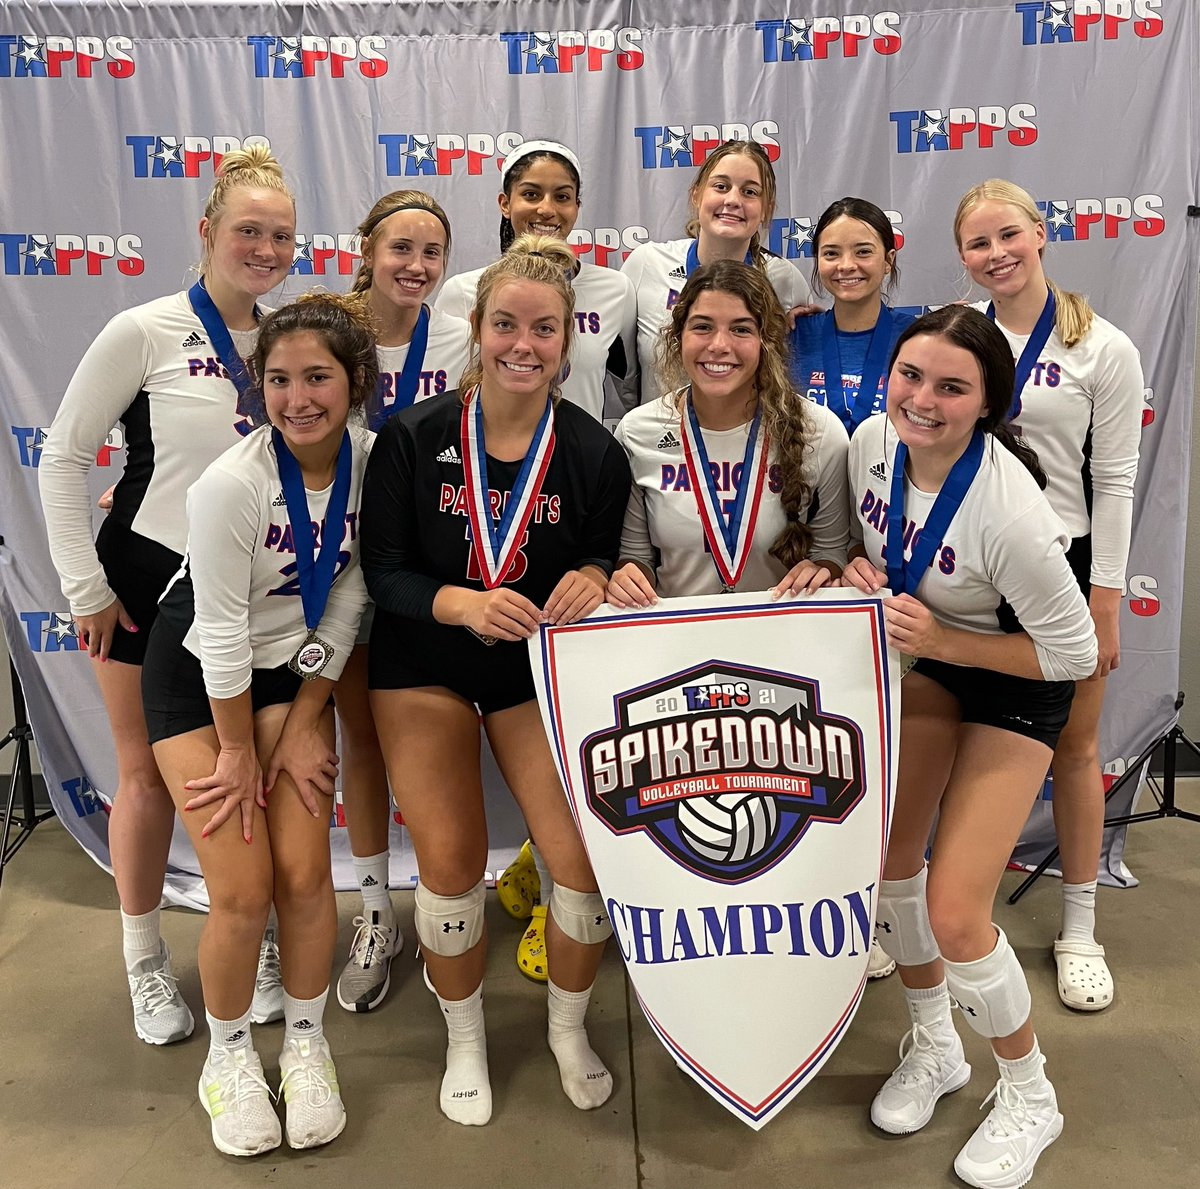 All Saints wins the TAPPS State-wide Pre-Season Spikfest volleyball tournament in Ft. Worth. Congrats ladies! @LoneStarVarsity @HubCityPrepsLBK @pchristy11 @AllSaintsPride @fox34 @RandyRosetta